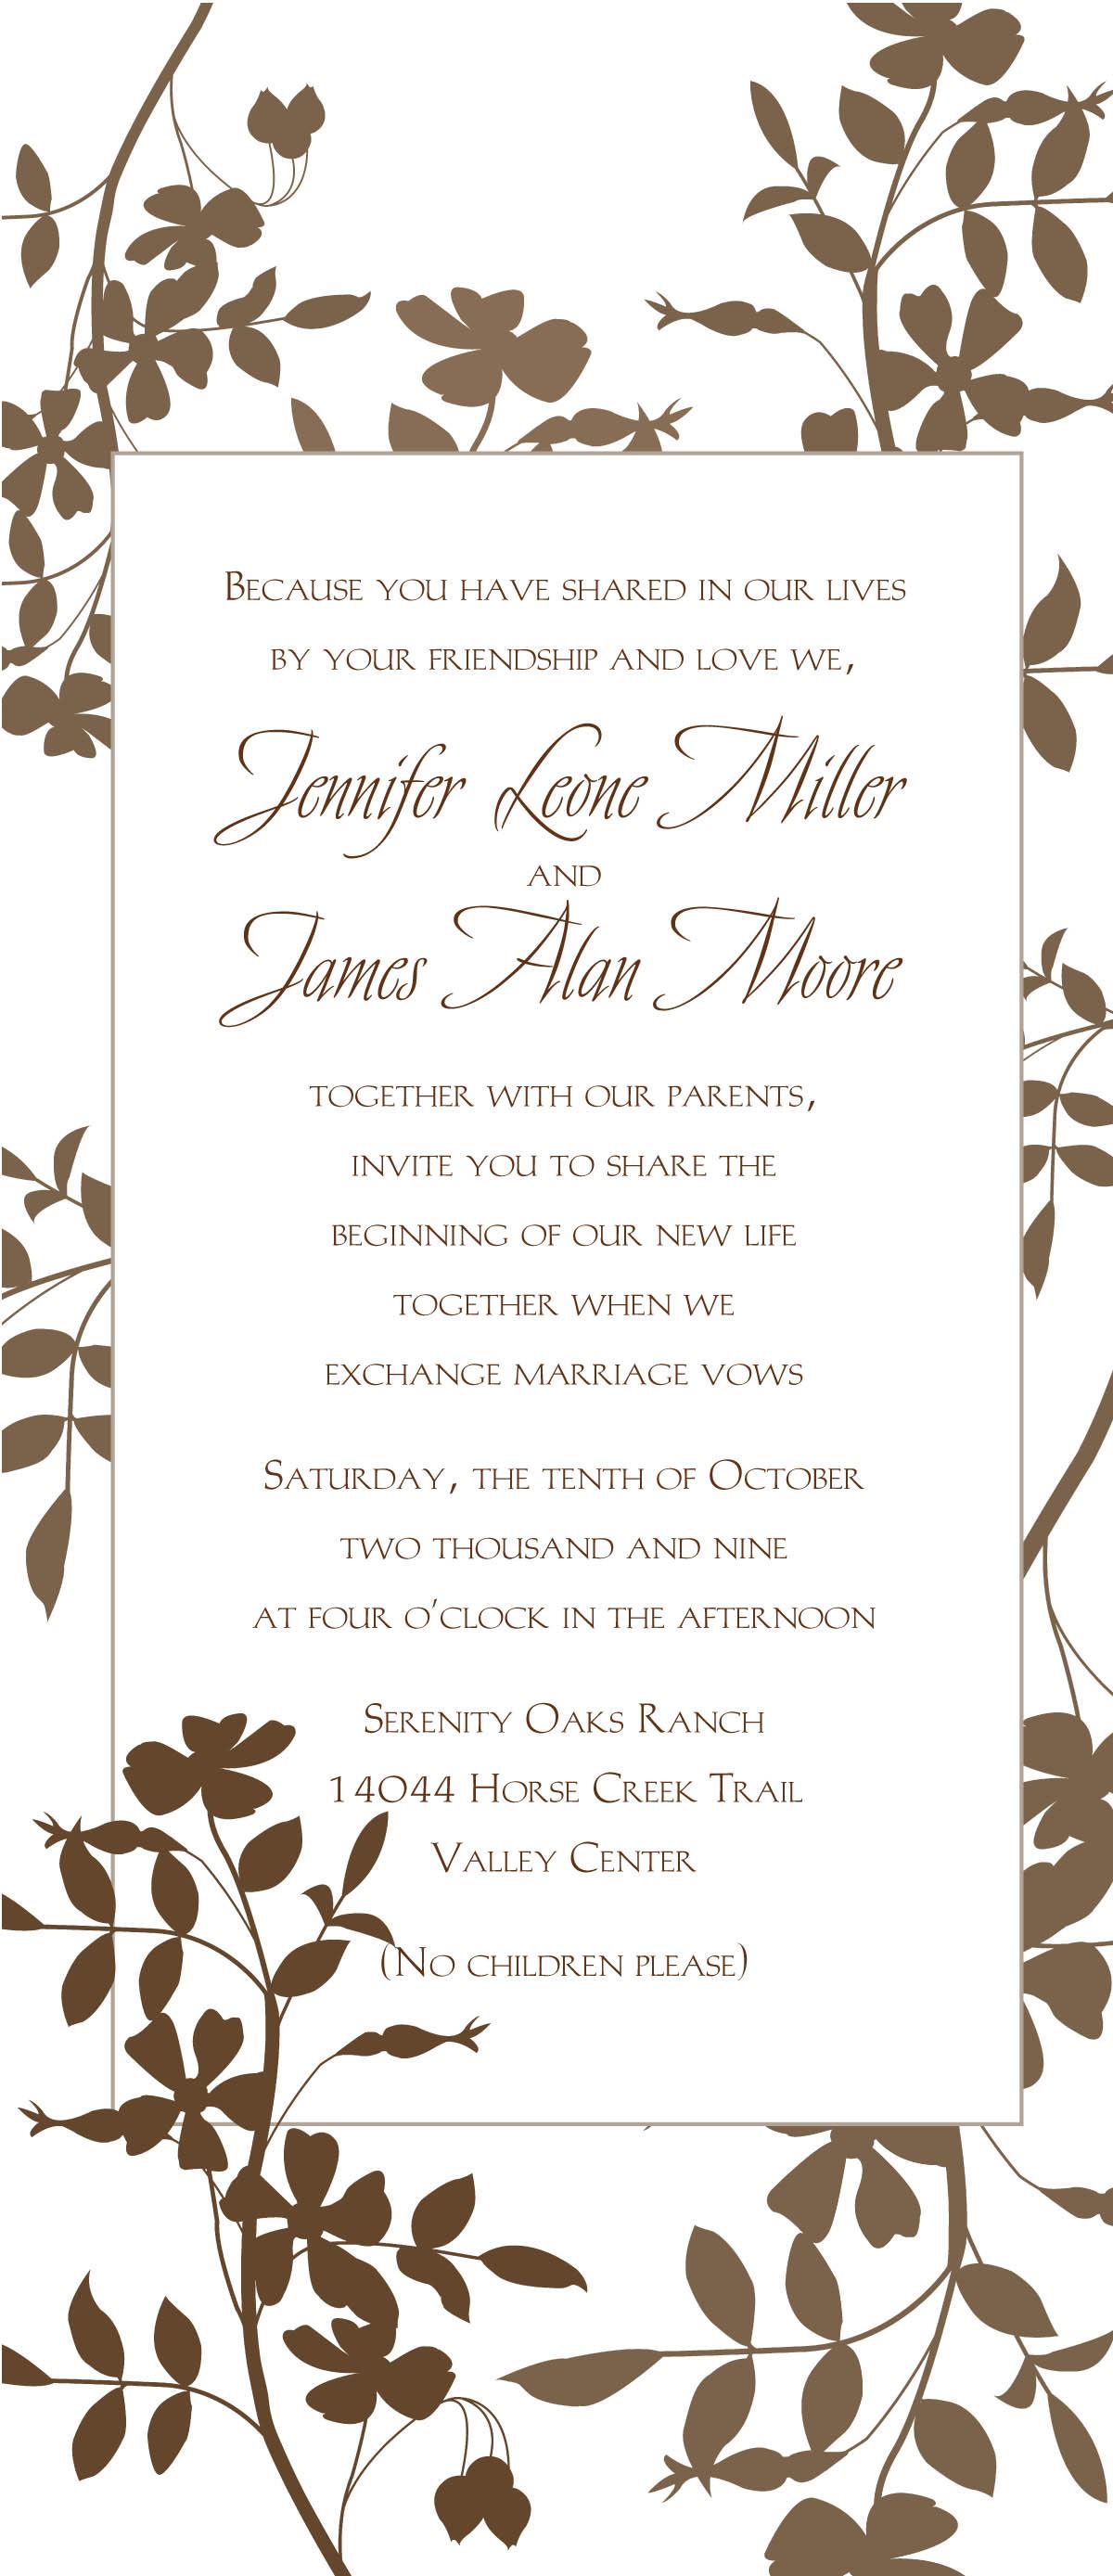 JM_JM_Wedding Invitation.jpg